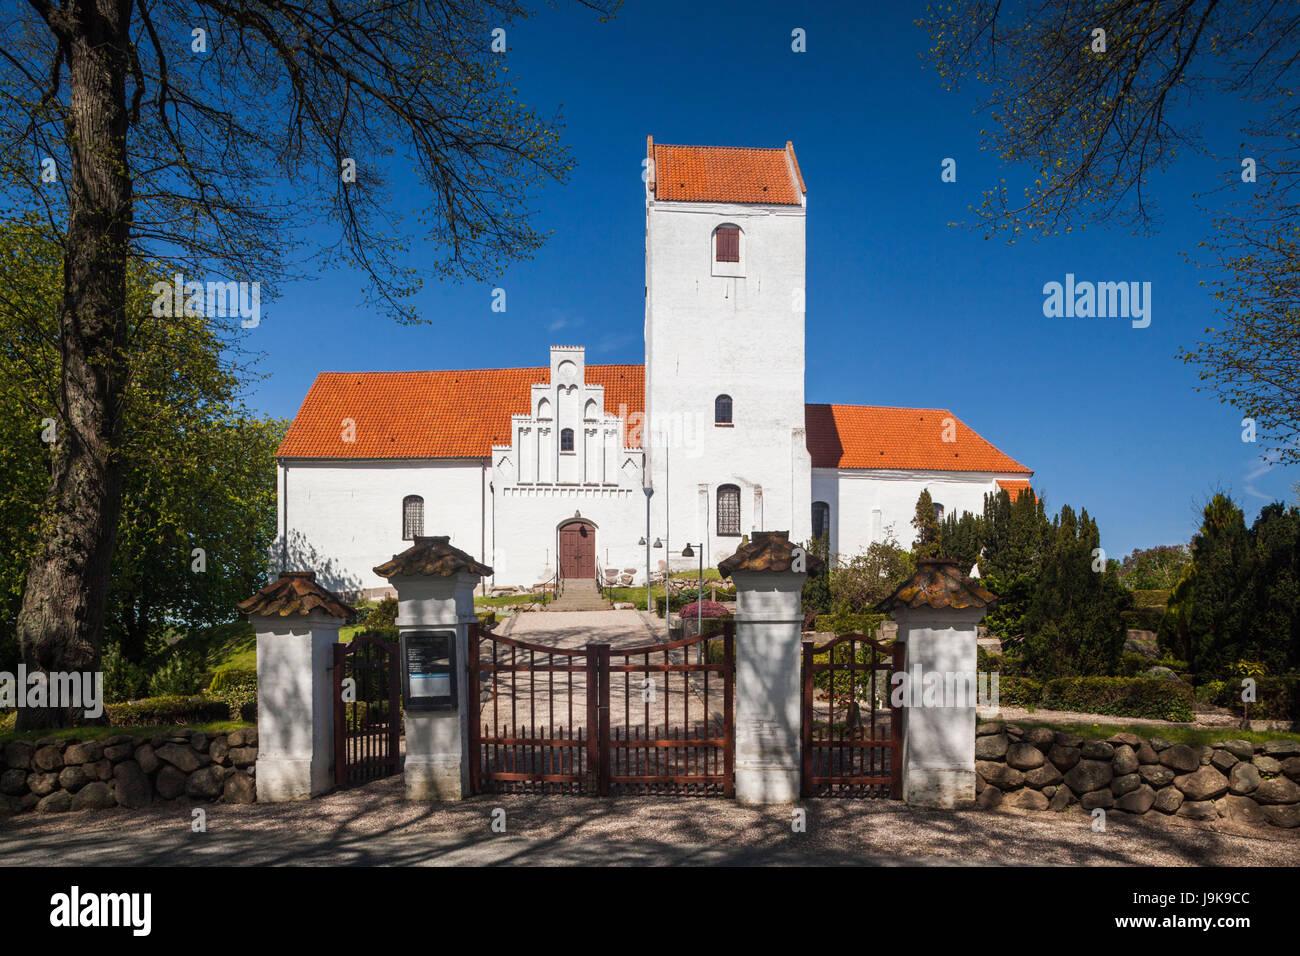 Le Danemark, Langeland, humble, humble village church Photo Stock